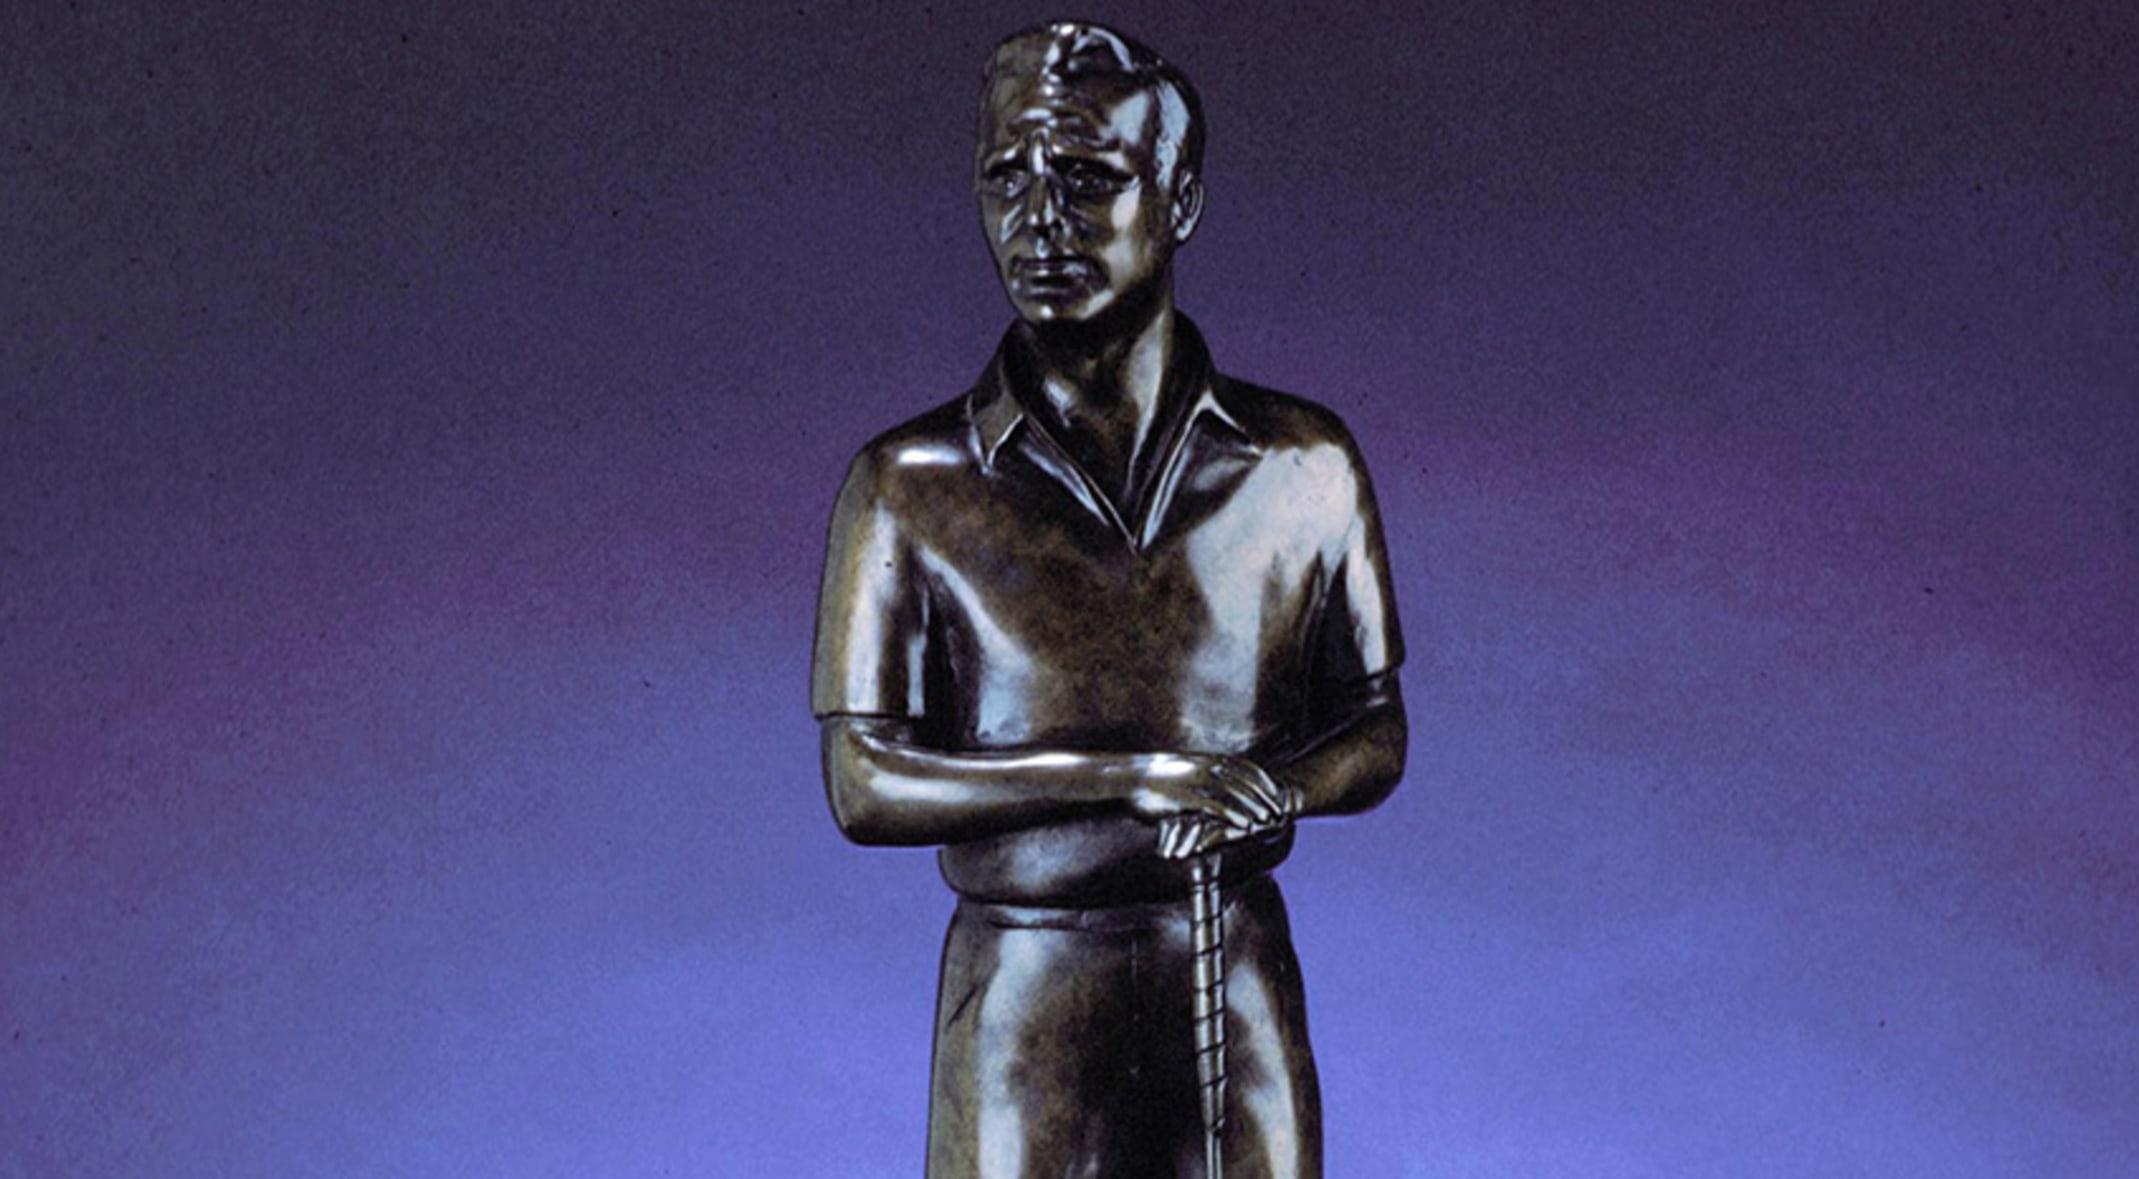 PGA TOUR Rookie of the Year to receive Arnold Palmer Award